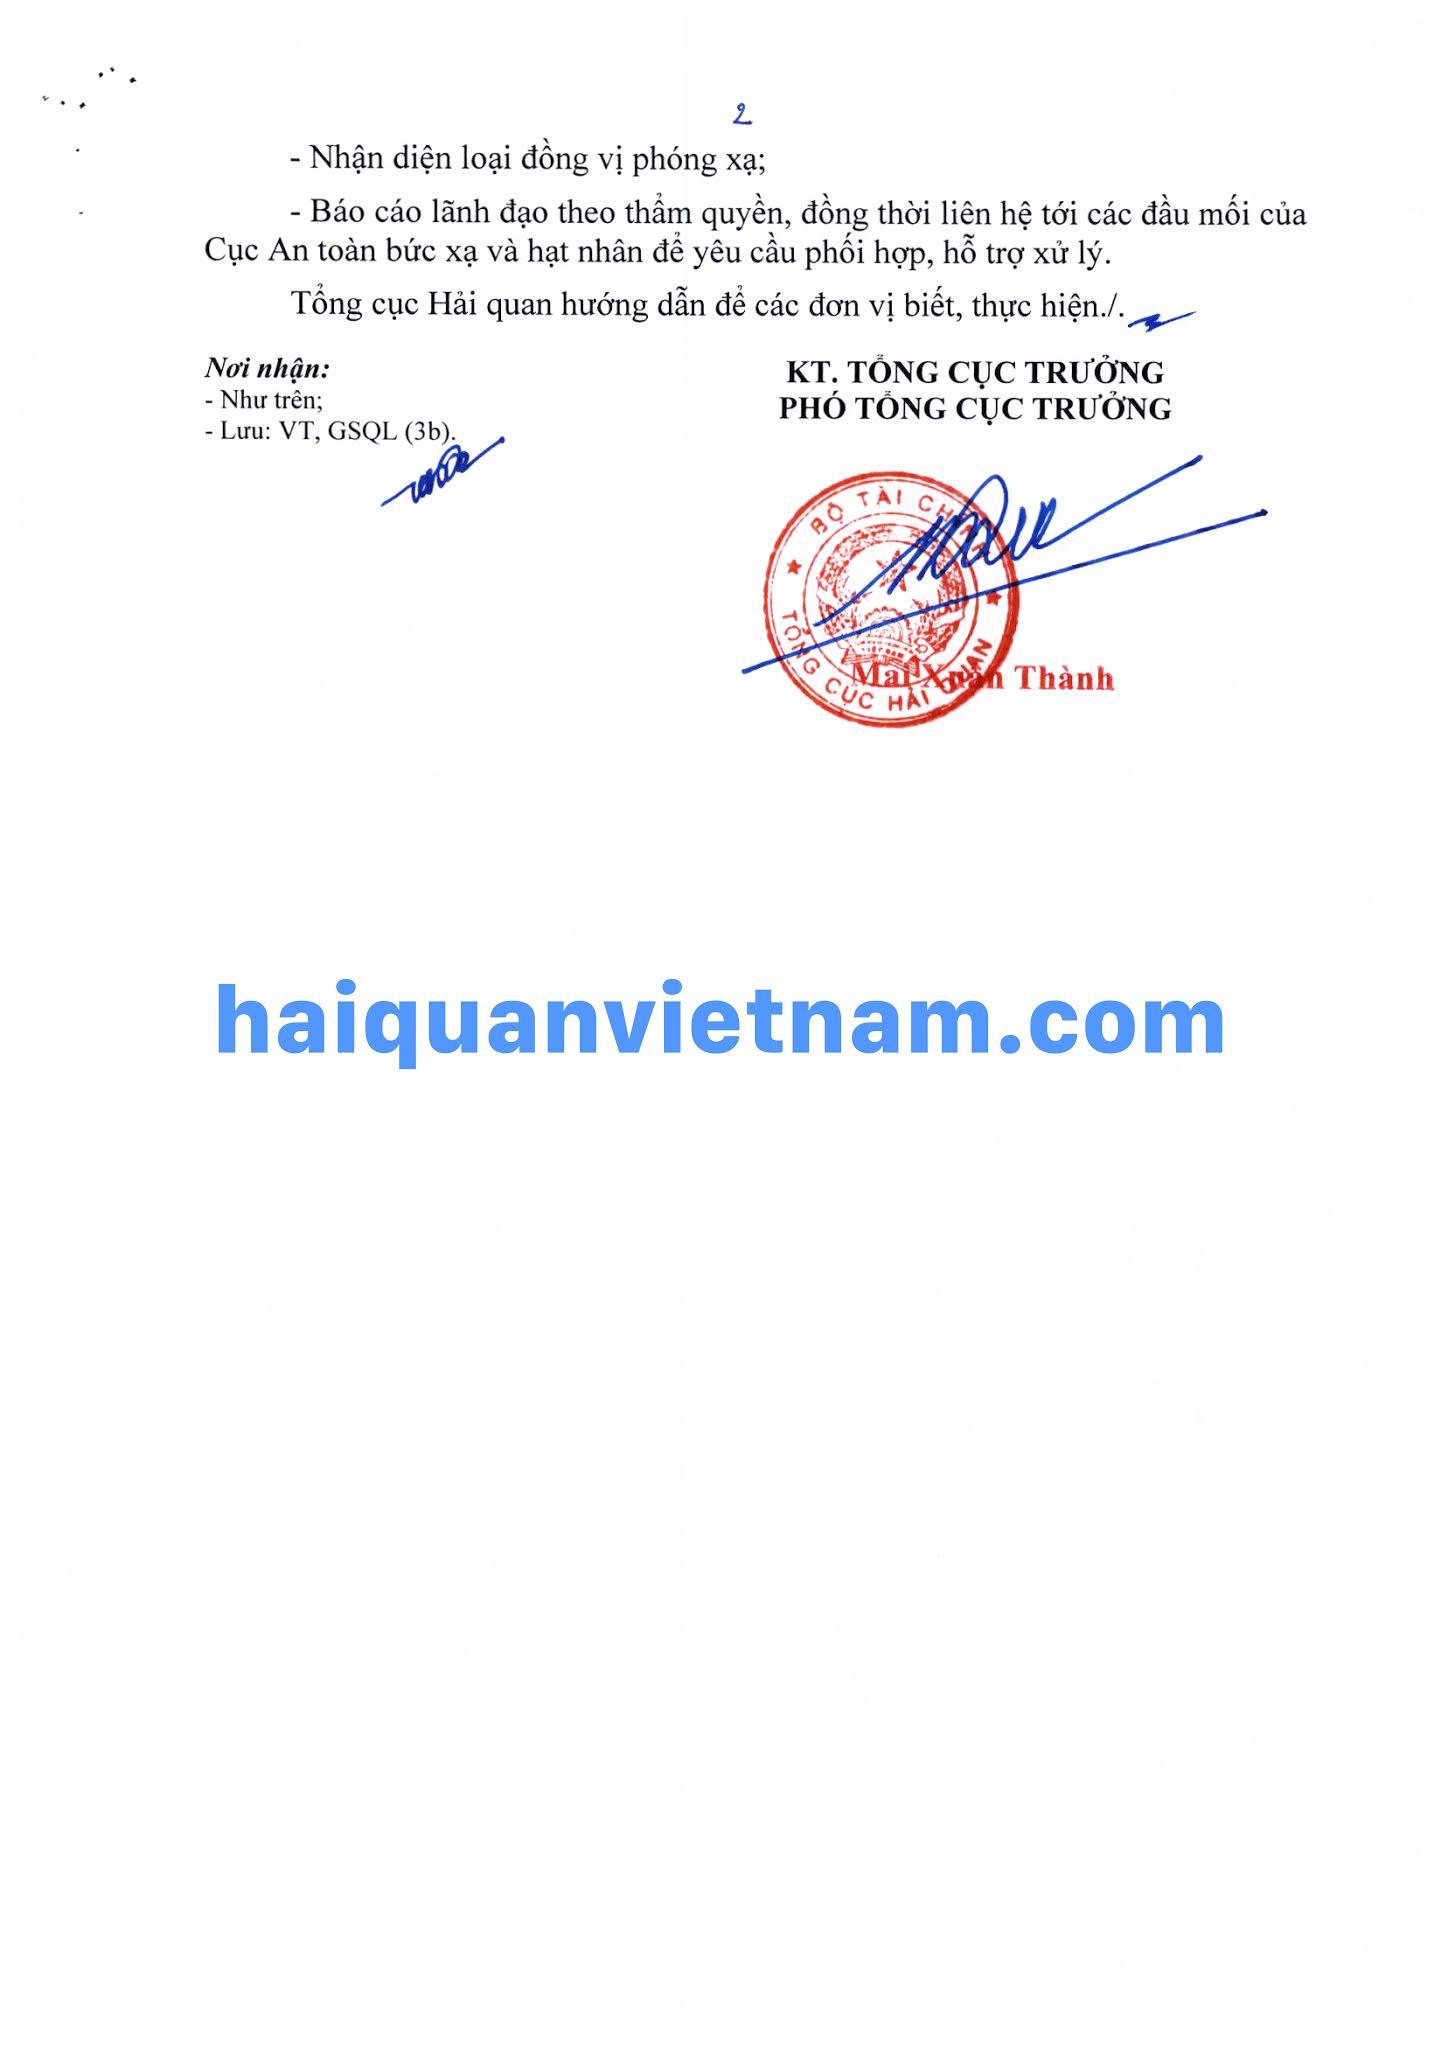 [Image: 210621_3104_TCHQ-GSQL_haiquanvietnam_02.jpg]